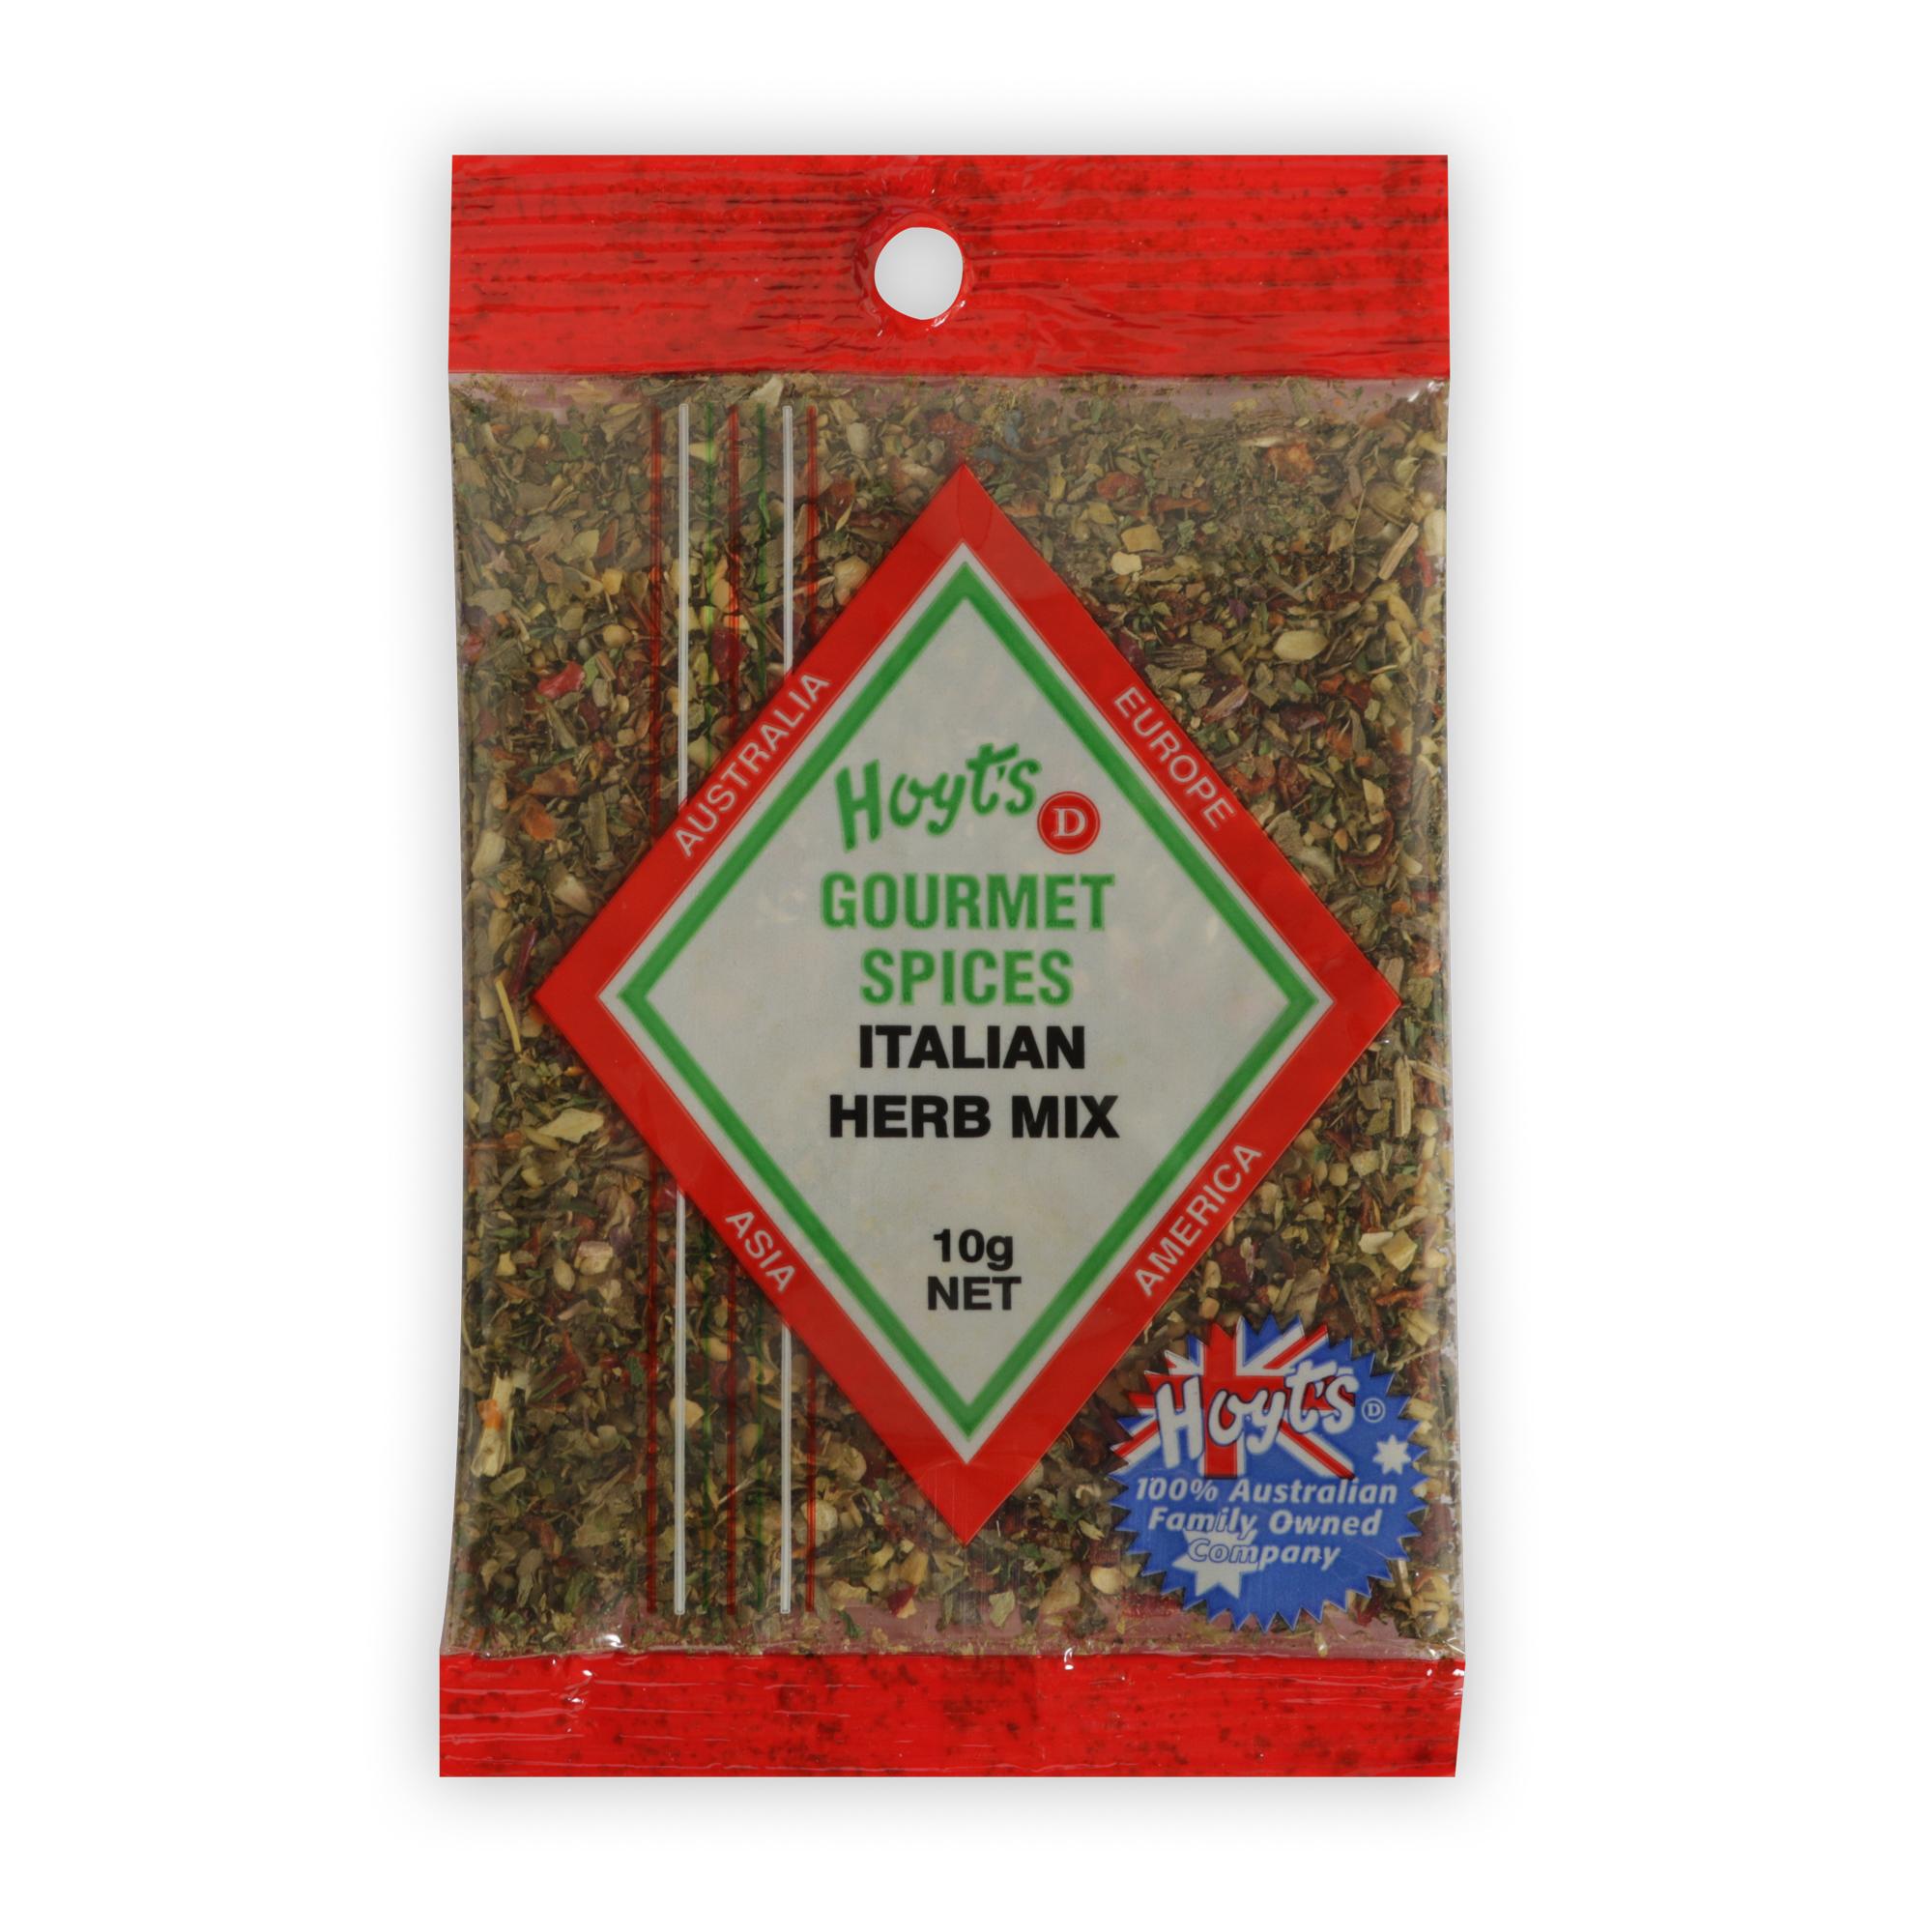 Gourmet Italian Herb Mix 10g - 9300725011505 1